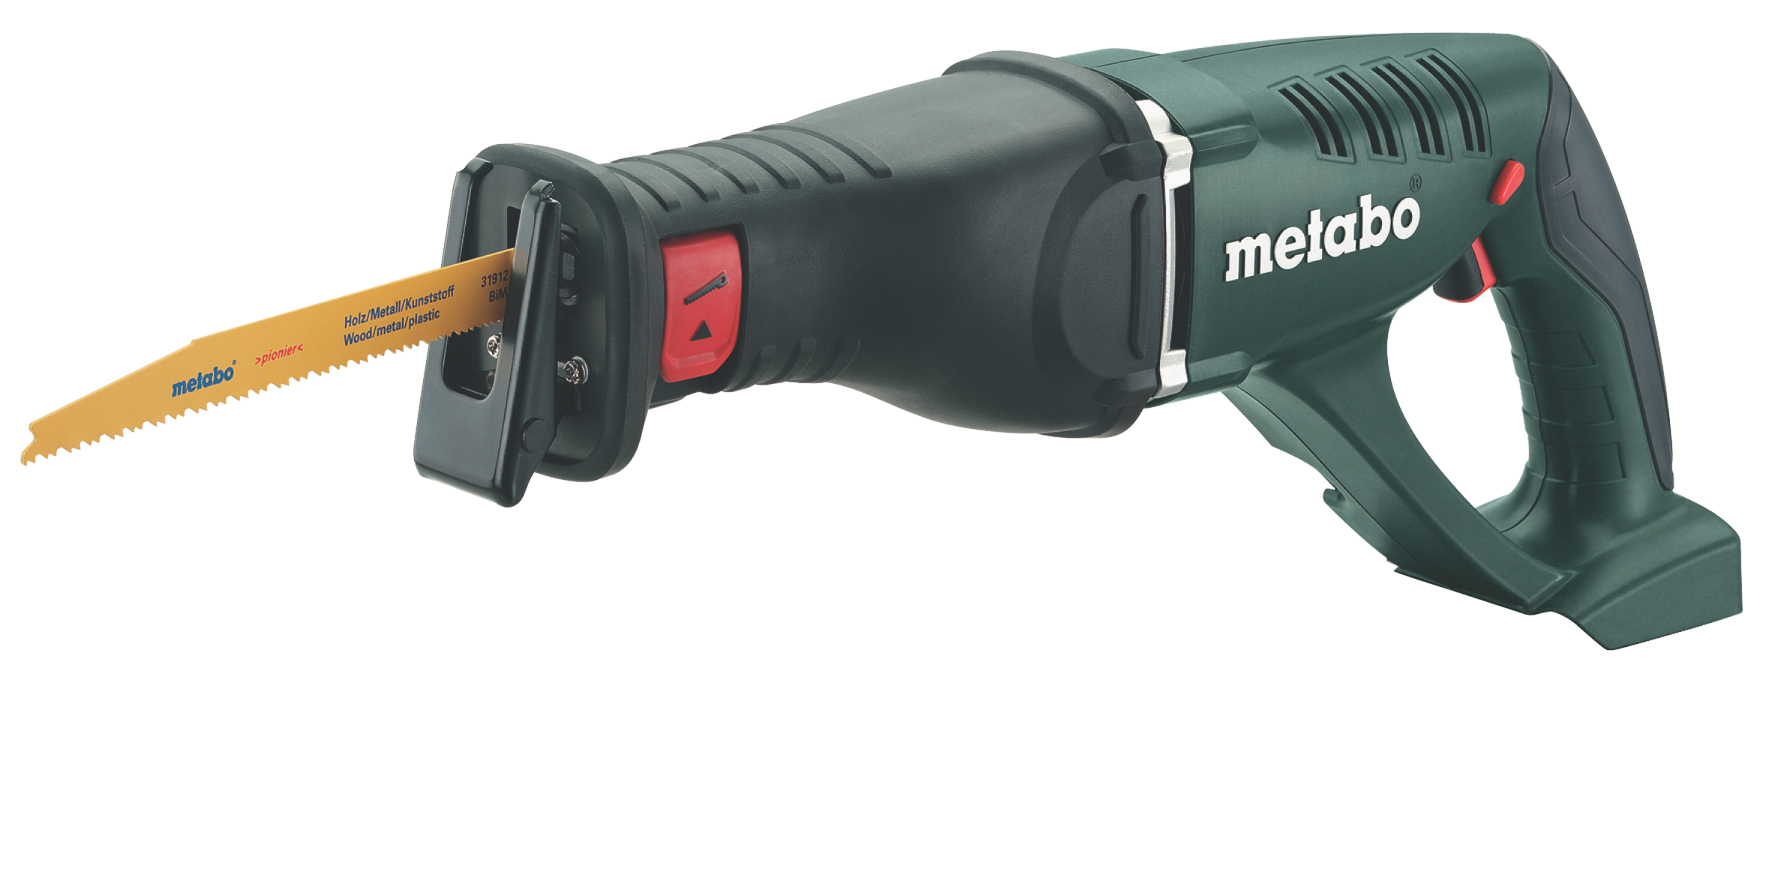 Аккумуляторная сабельная пила Metabo Ase 18 ltx (602269850) аккумуляторная ножовка metabo ase 18 ltx 602269610